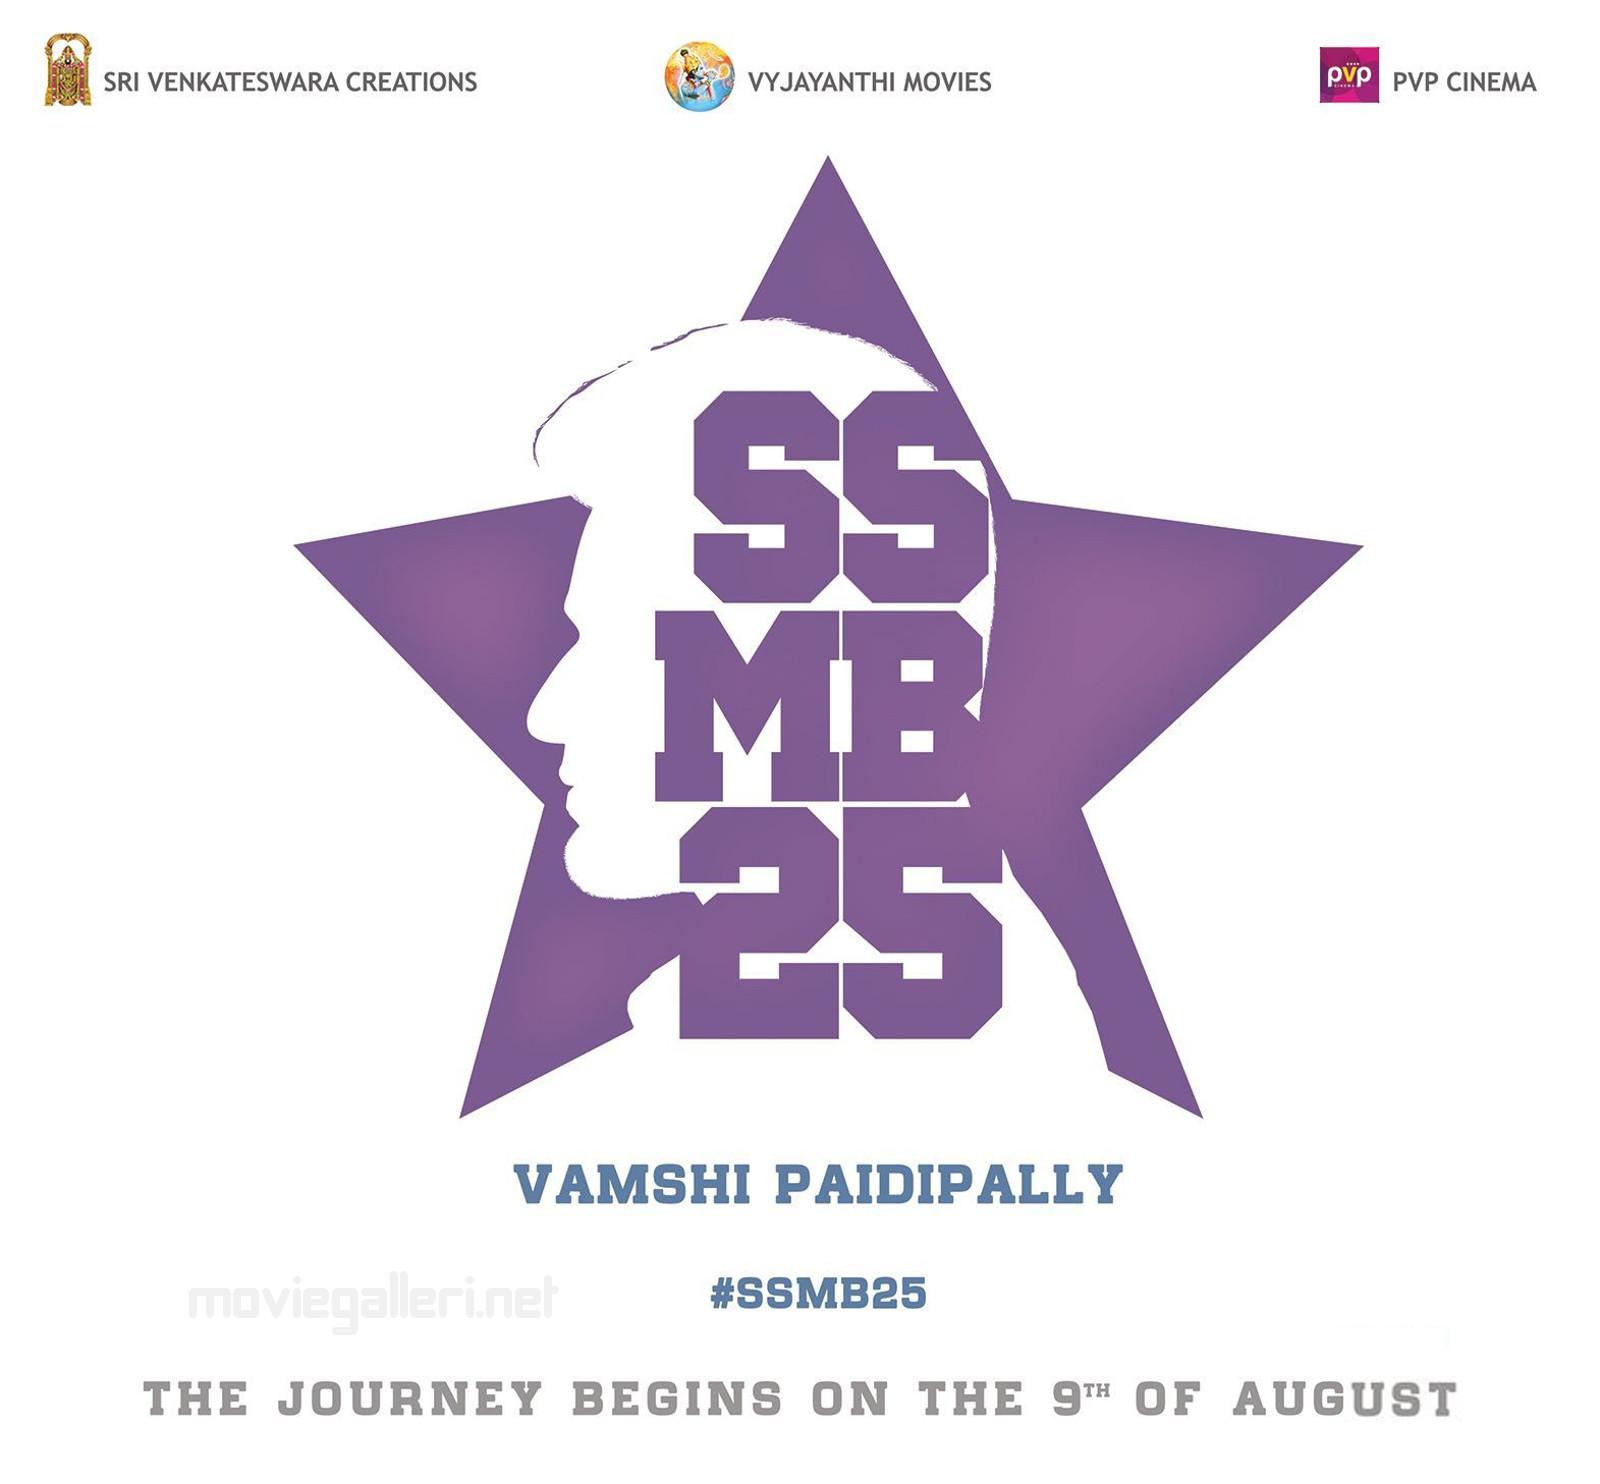 Mahesh Babu Vamsi Paidipally SSMB25 Movie Emblem Launched